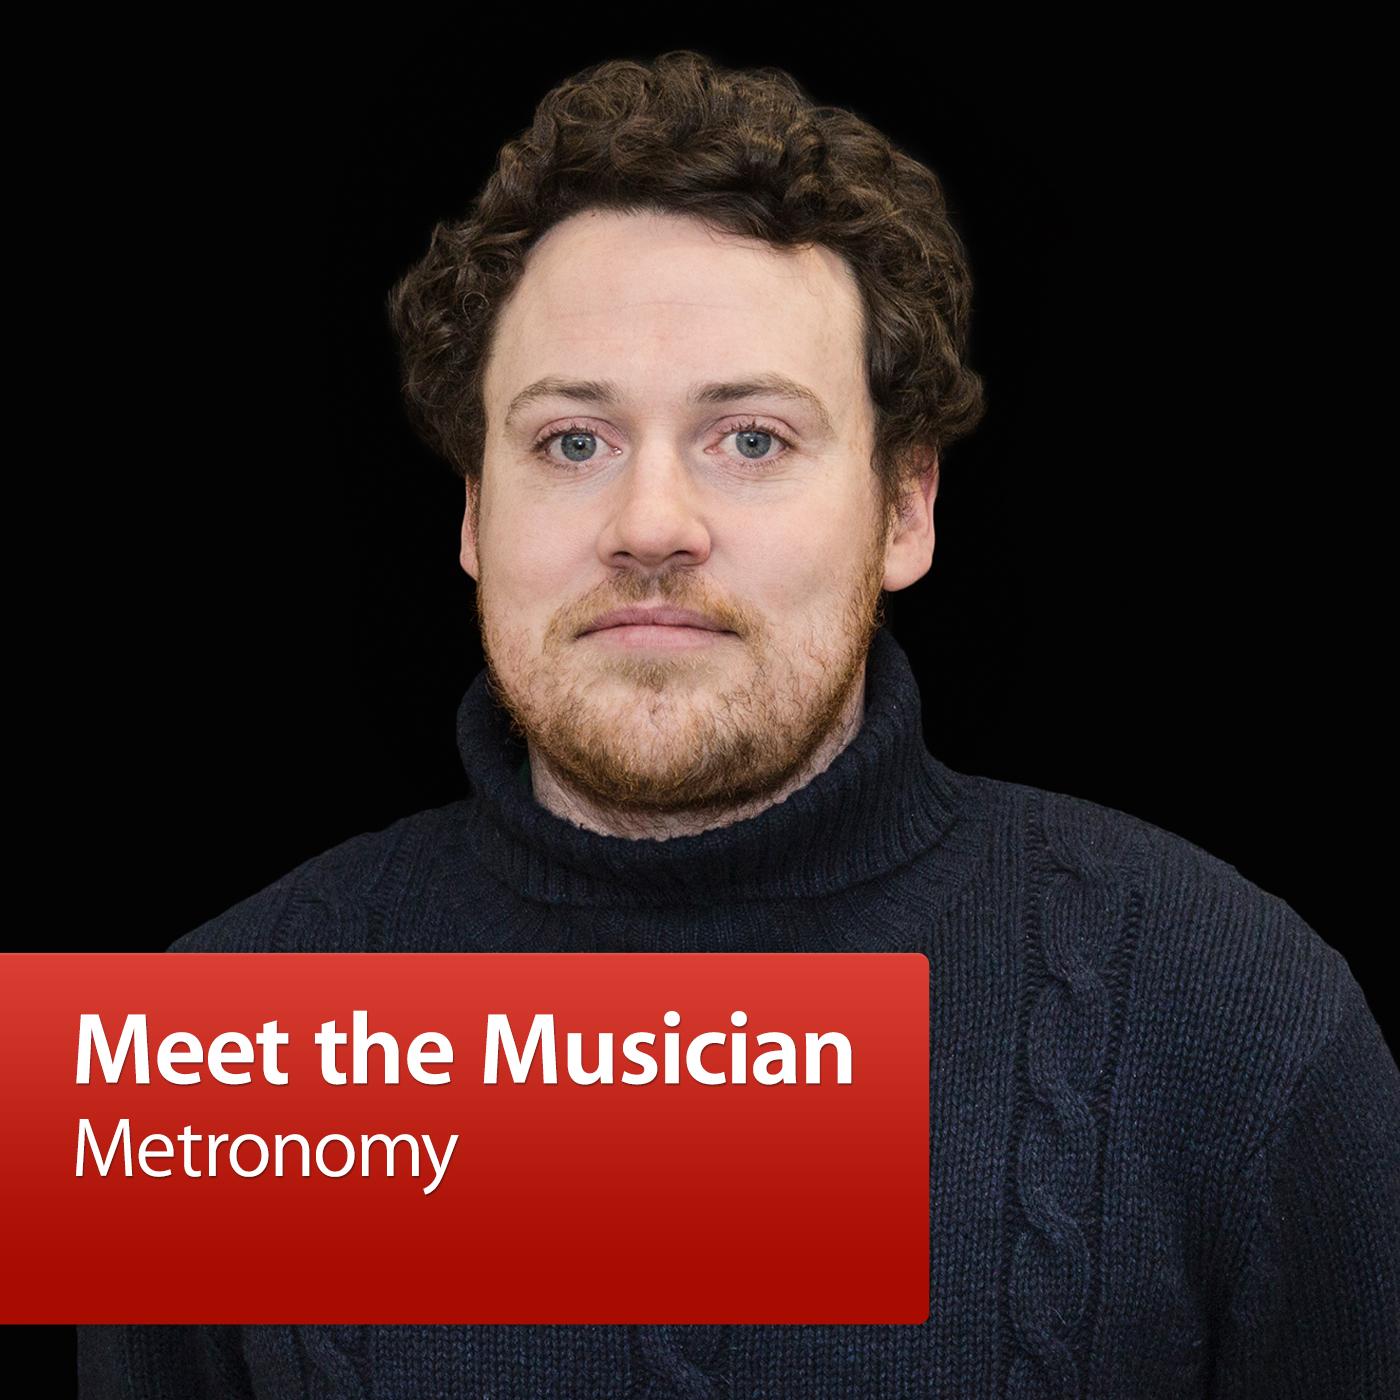 Metronomy: Meet the Musician